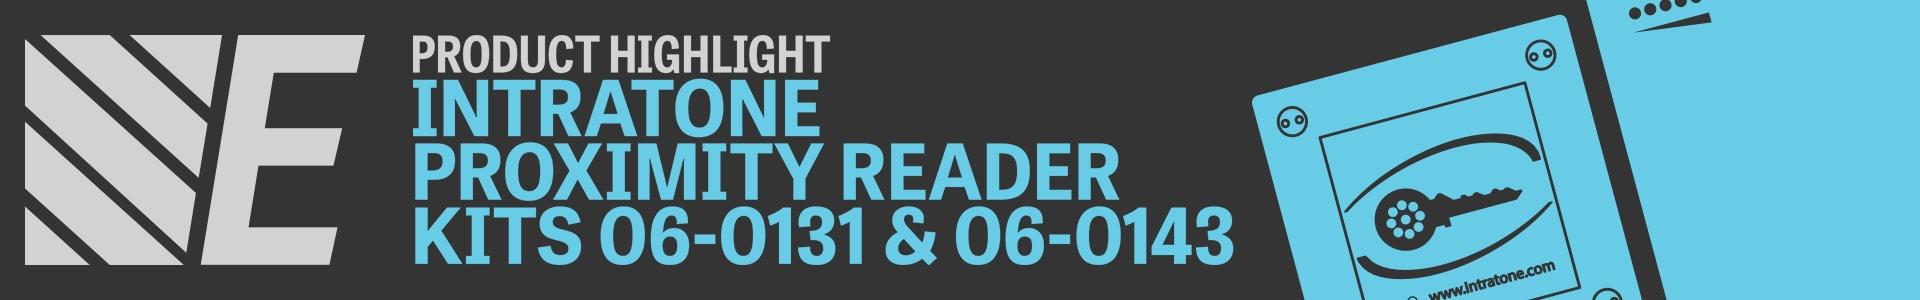 Product Highlight - Intratone Proximity Reader Kits